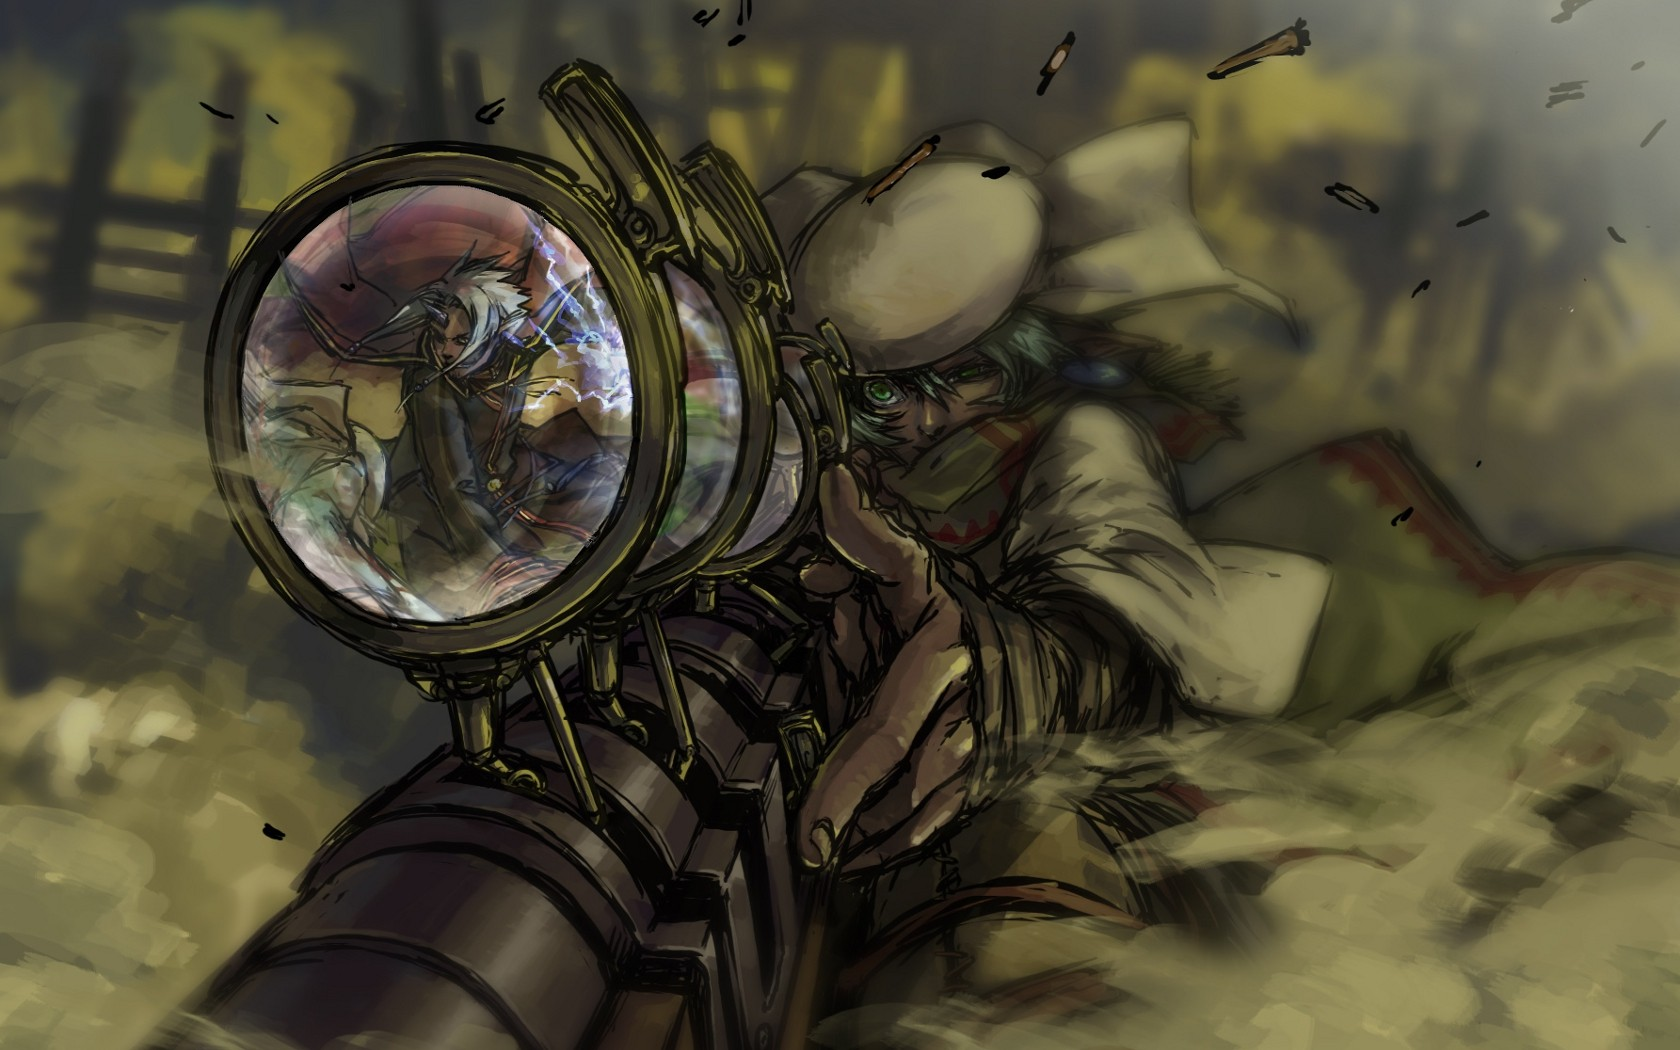 Sniper Steam Punk Wallpapers 1680x1050